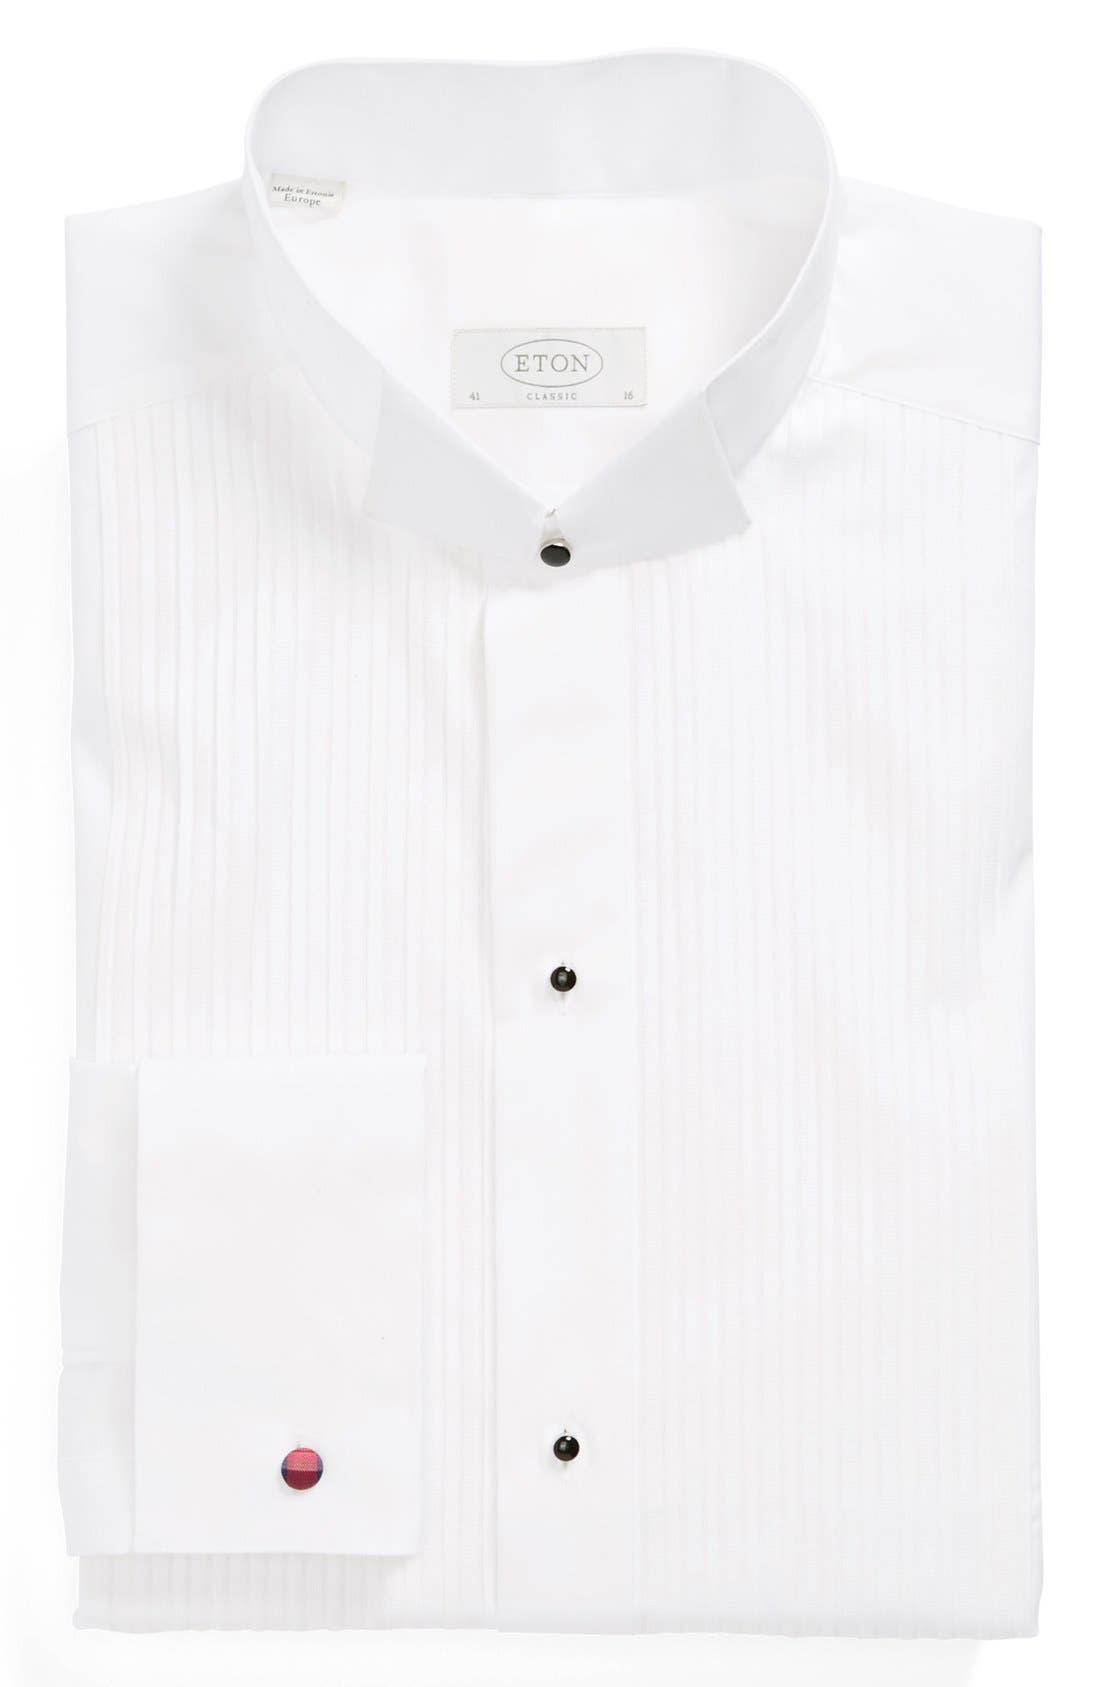 Alternate Image 1 Selected - Eton Classic Fit Dress Shirt